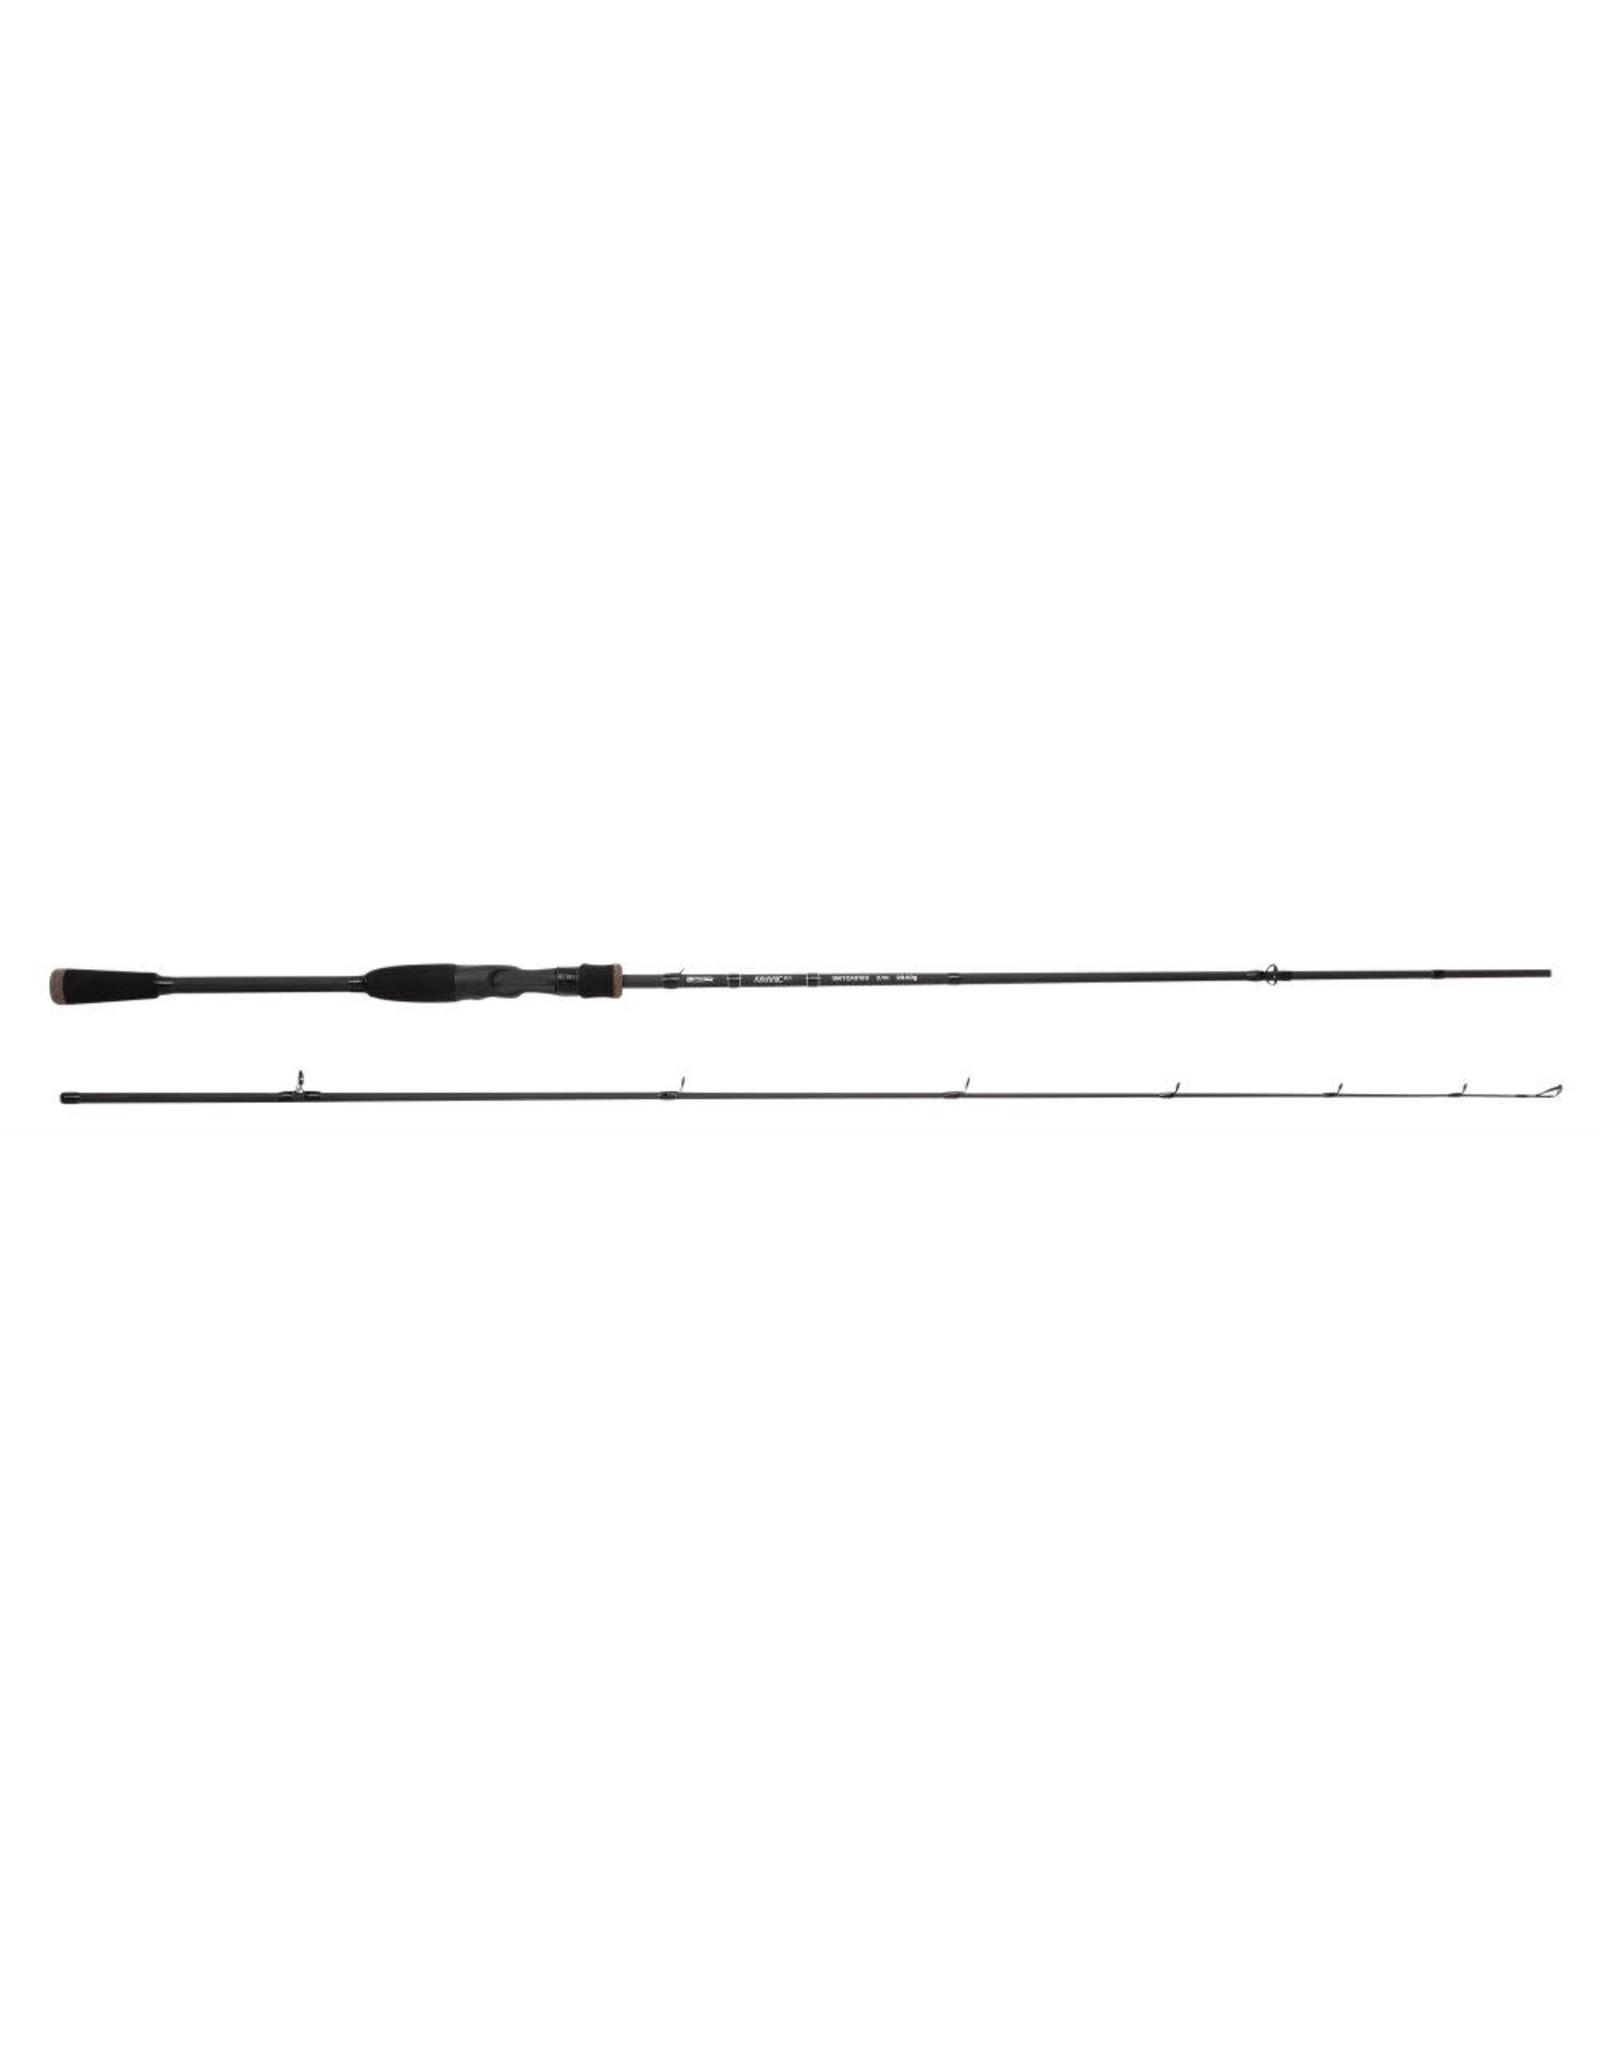 SPRO MIMIC 2.0 BAITCASTER 2.1M 20-60G